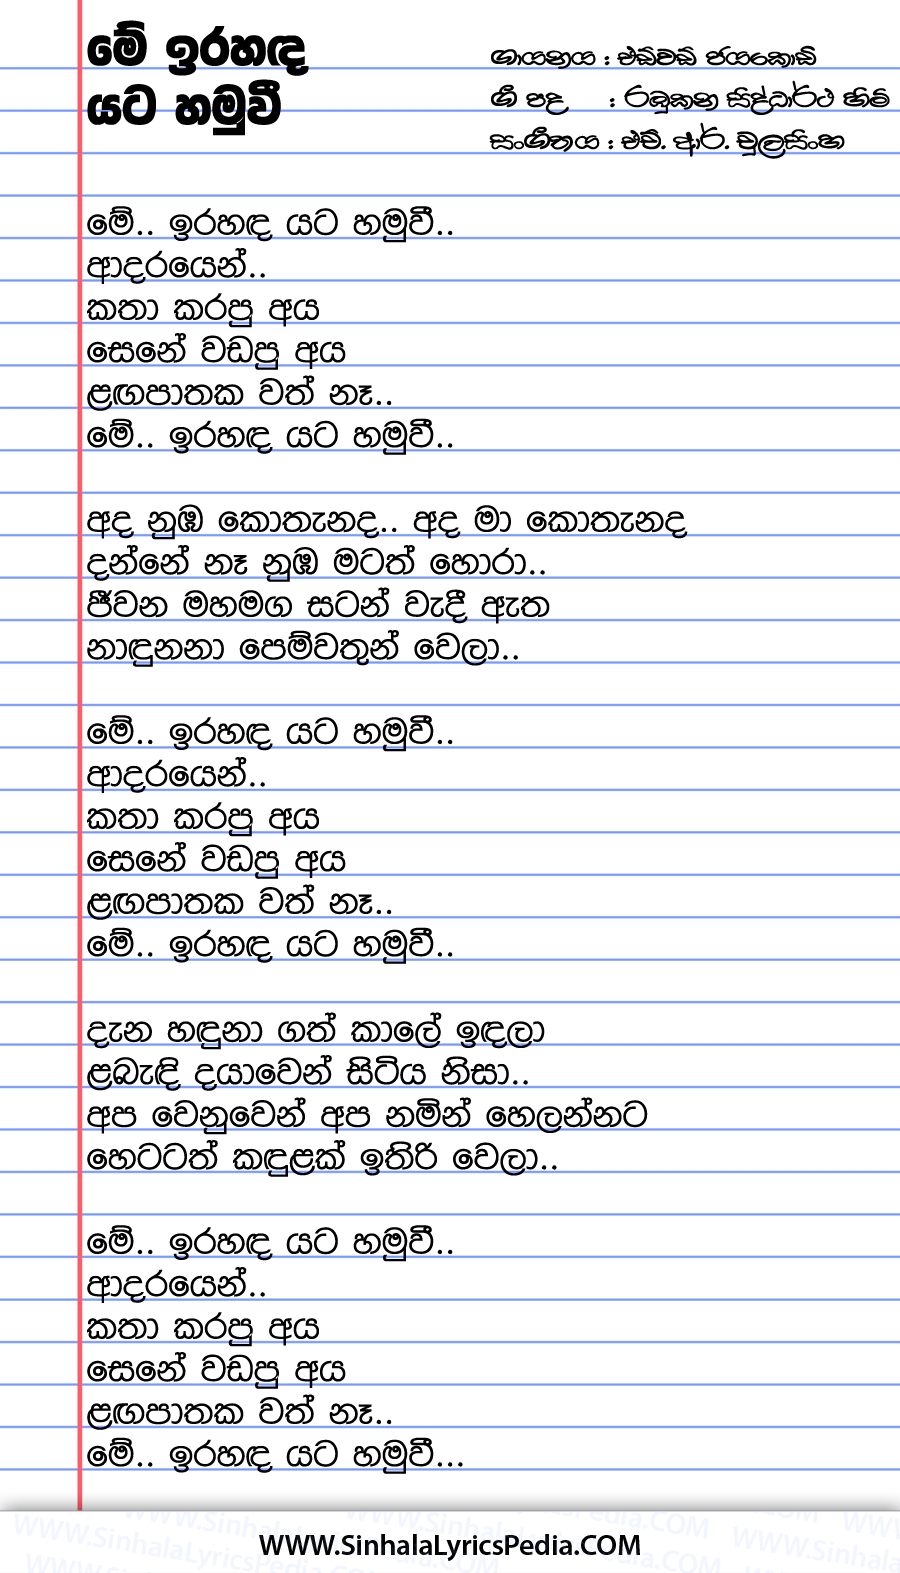 Me Ira Handa Yata Hamu Wee Song Lyrics